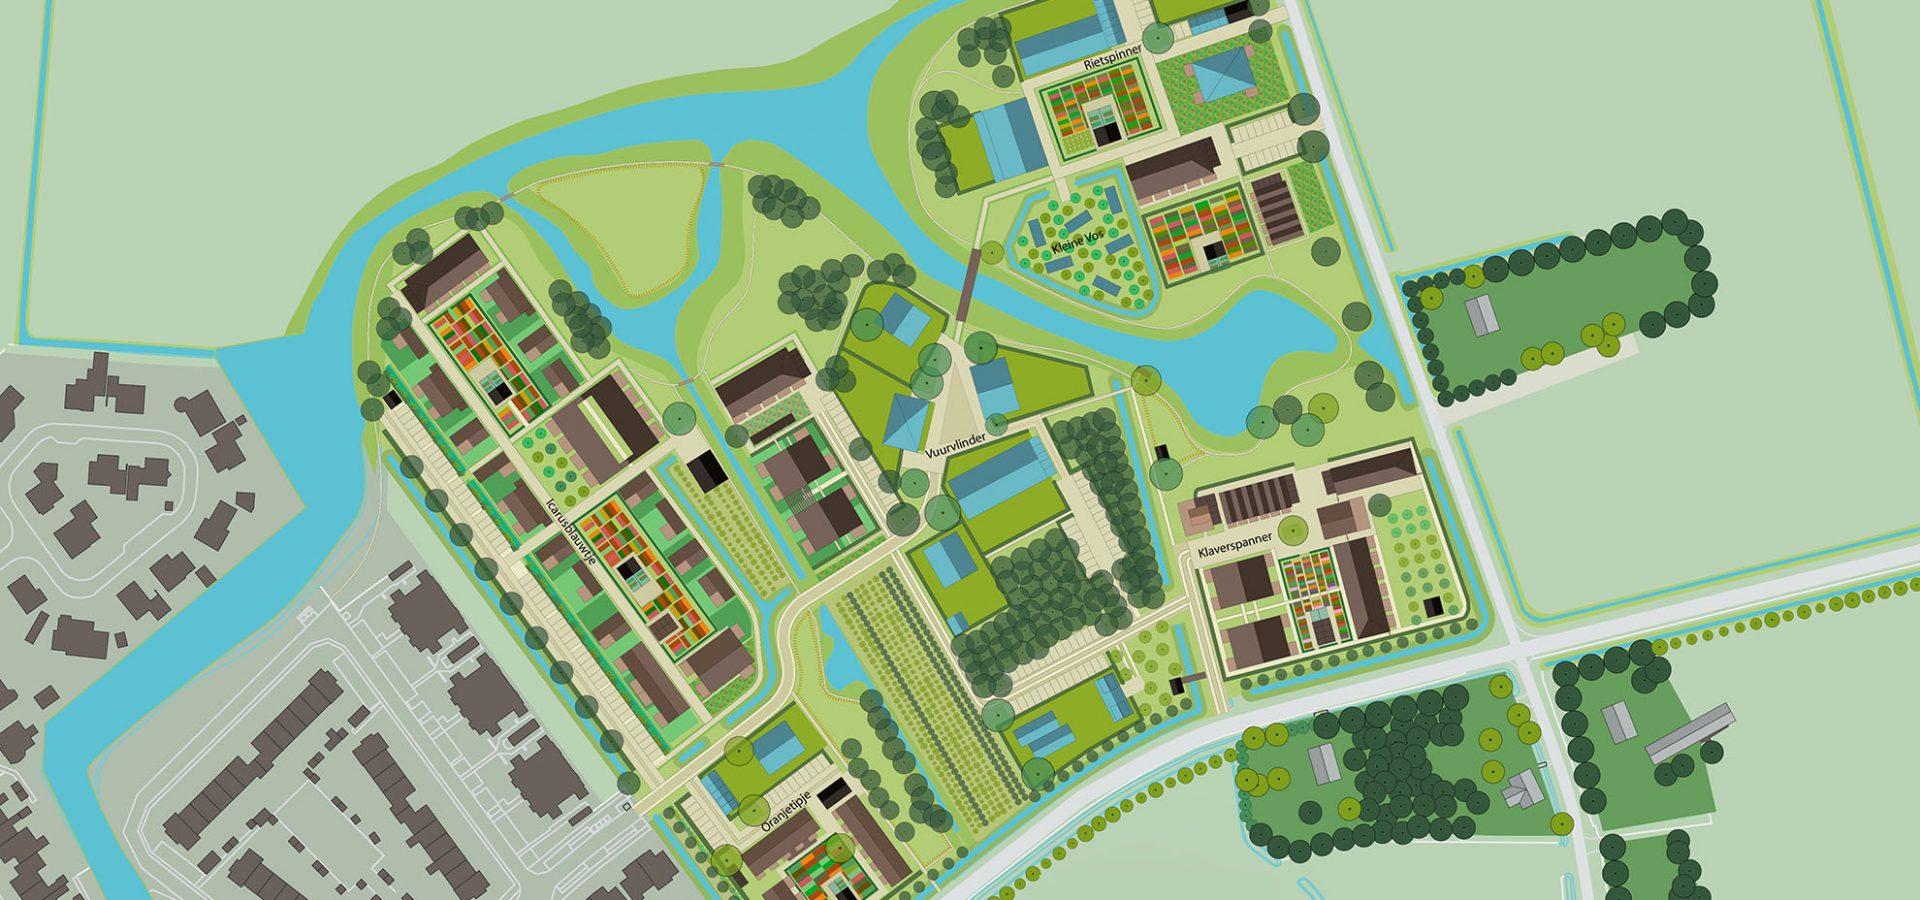 FARO architecten Buurtskap de Tuunen Texel 02